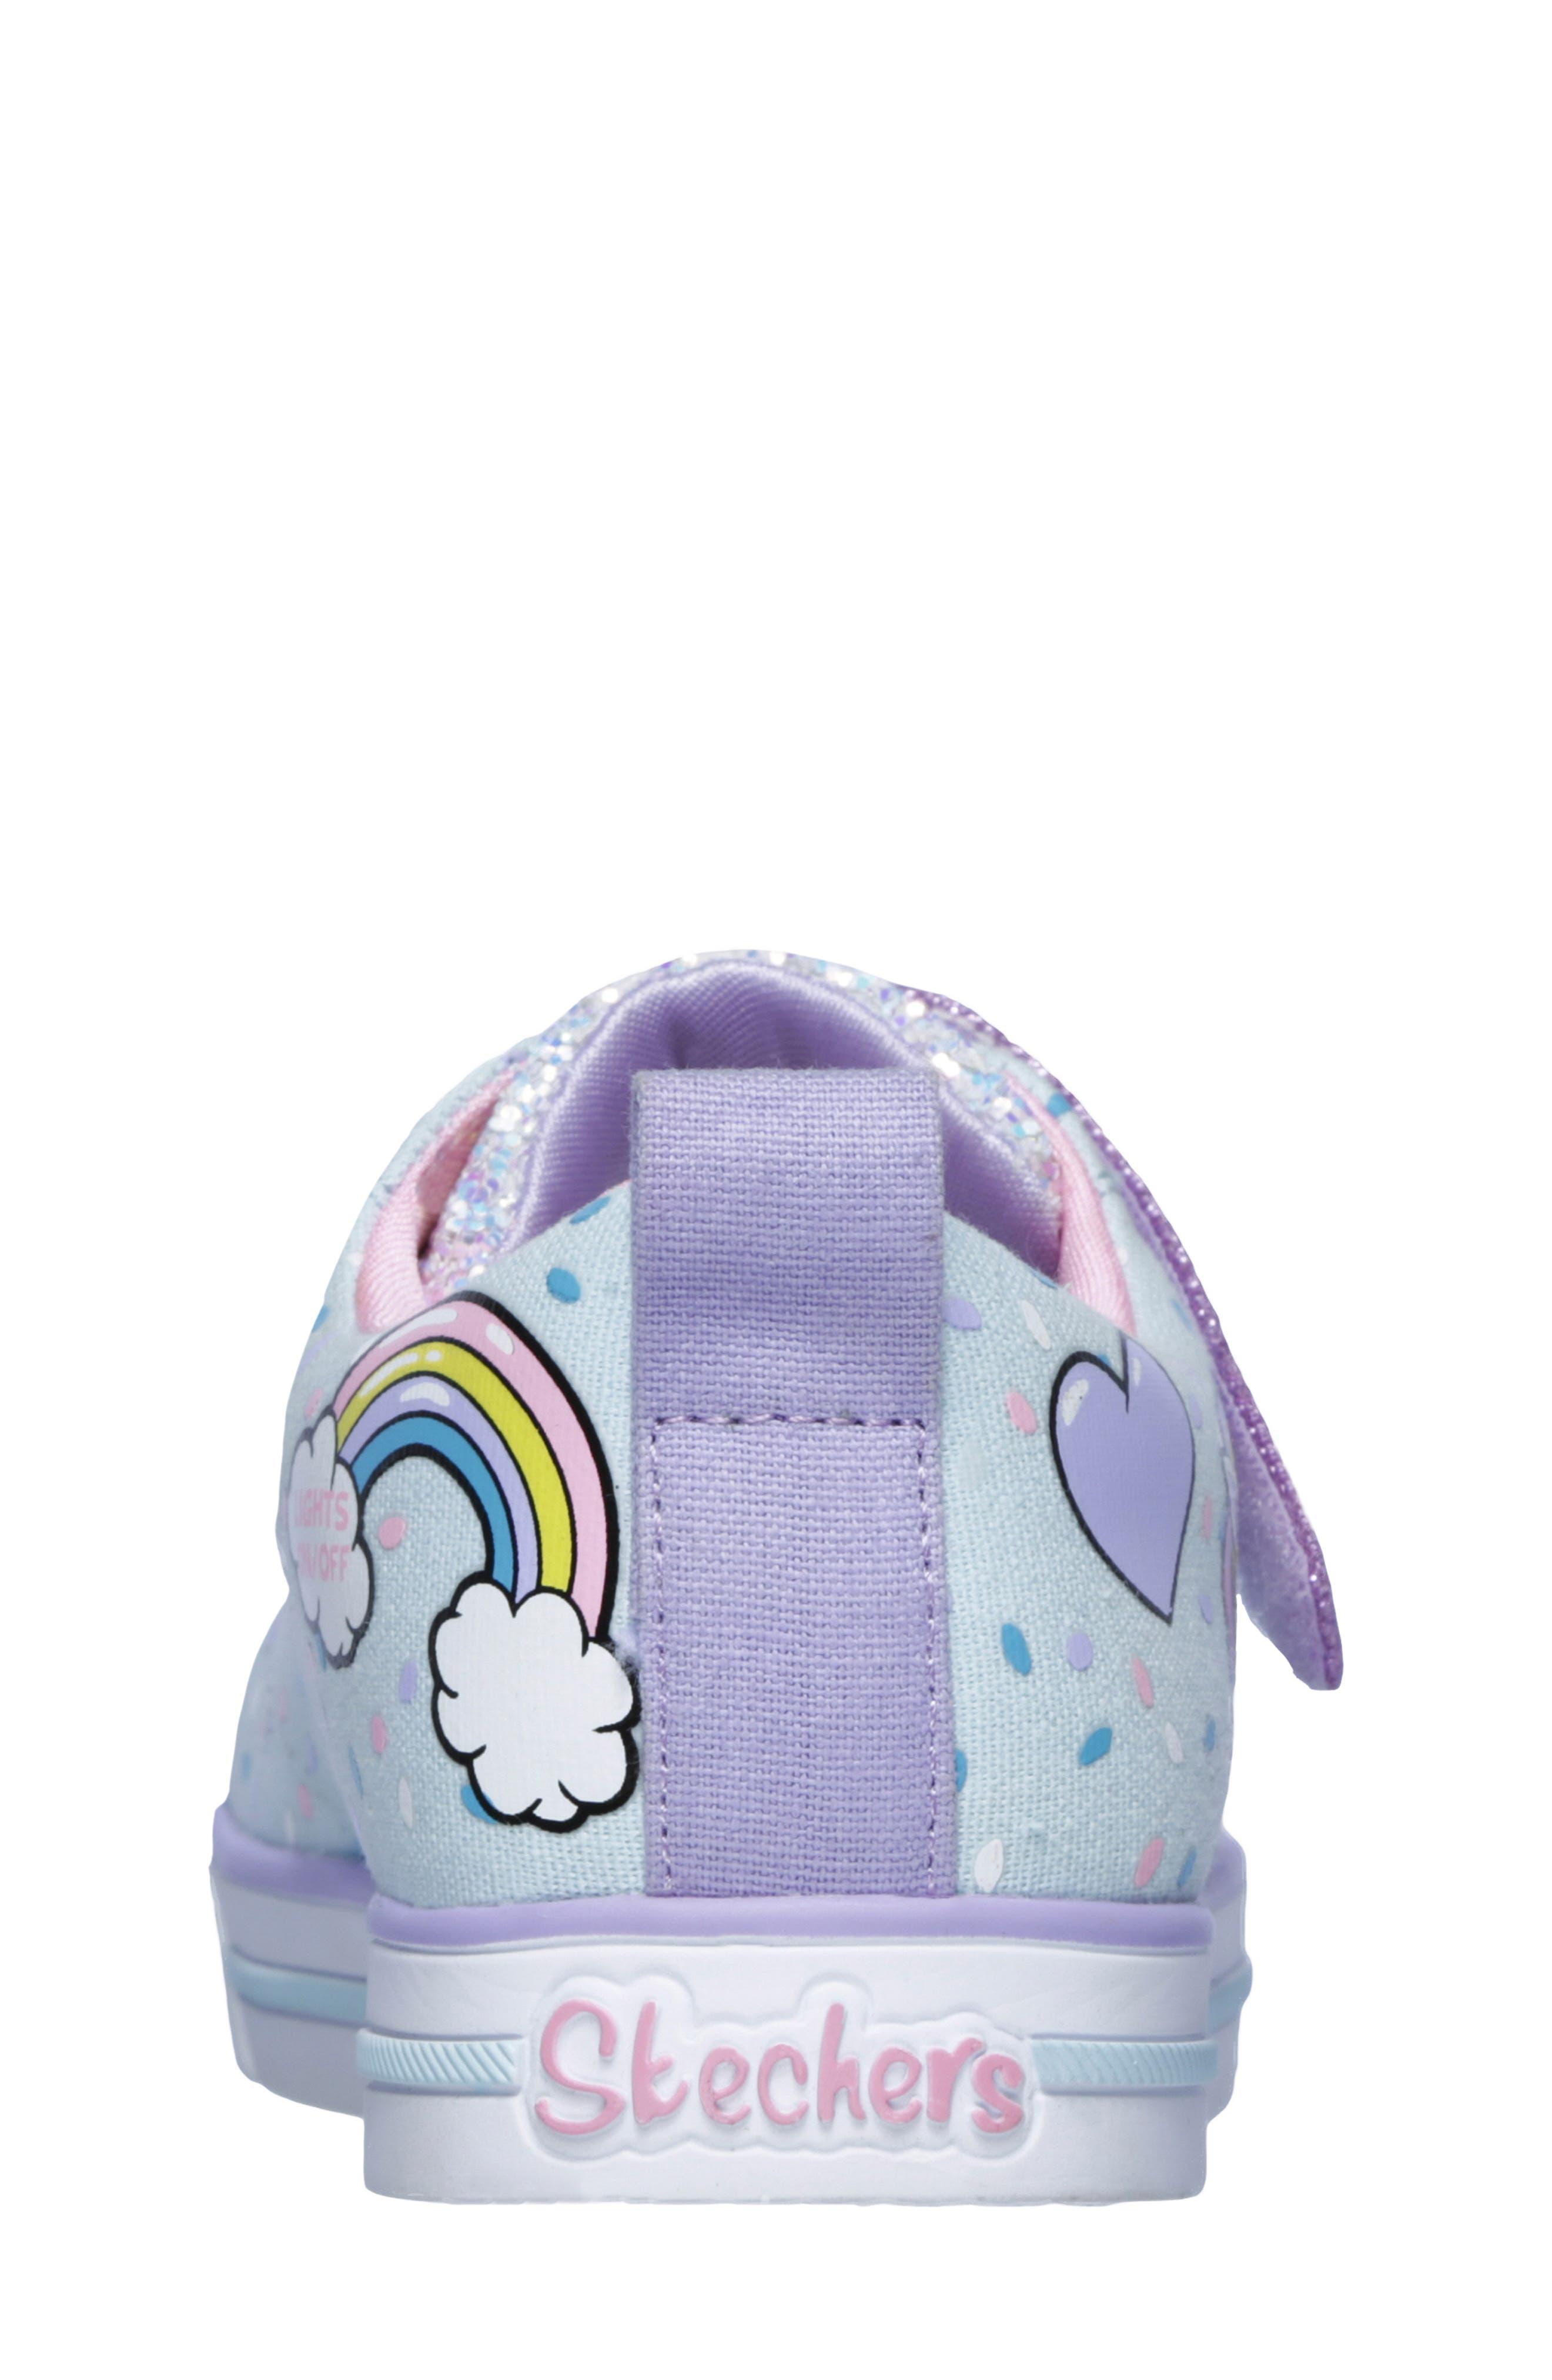 Twinkle Toes Unicorn Light-Up Sneaker,                             Alternate thumbnail 2, color,                             LIGHT BLUE/ MULTI